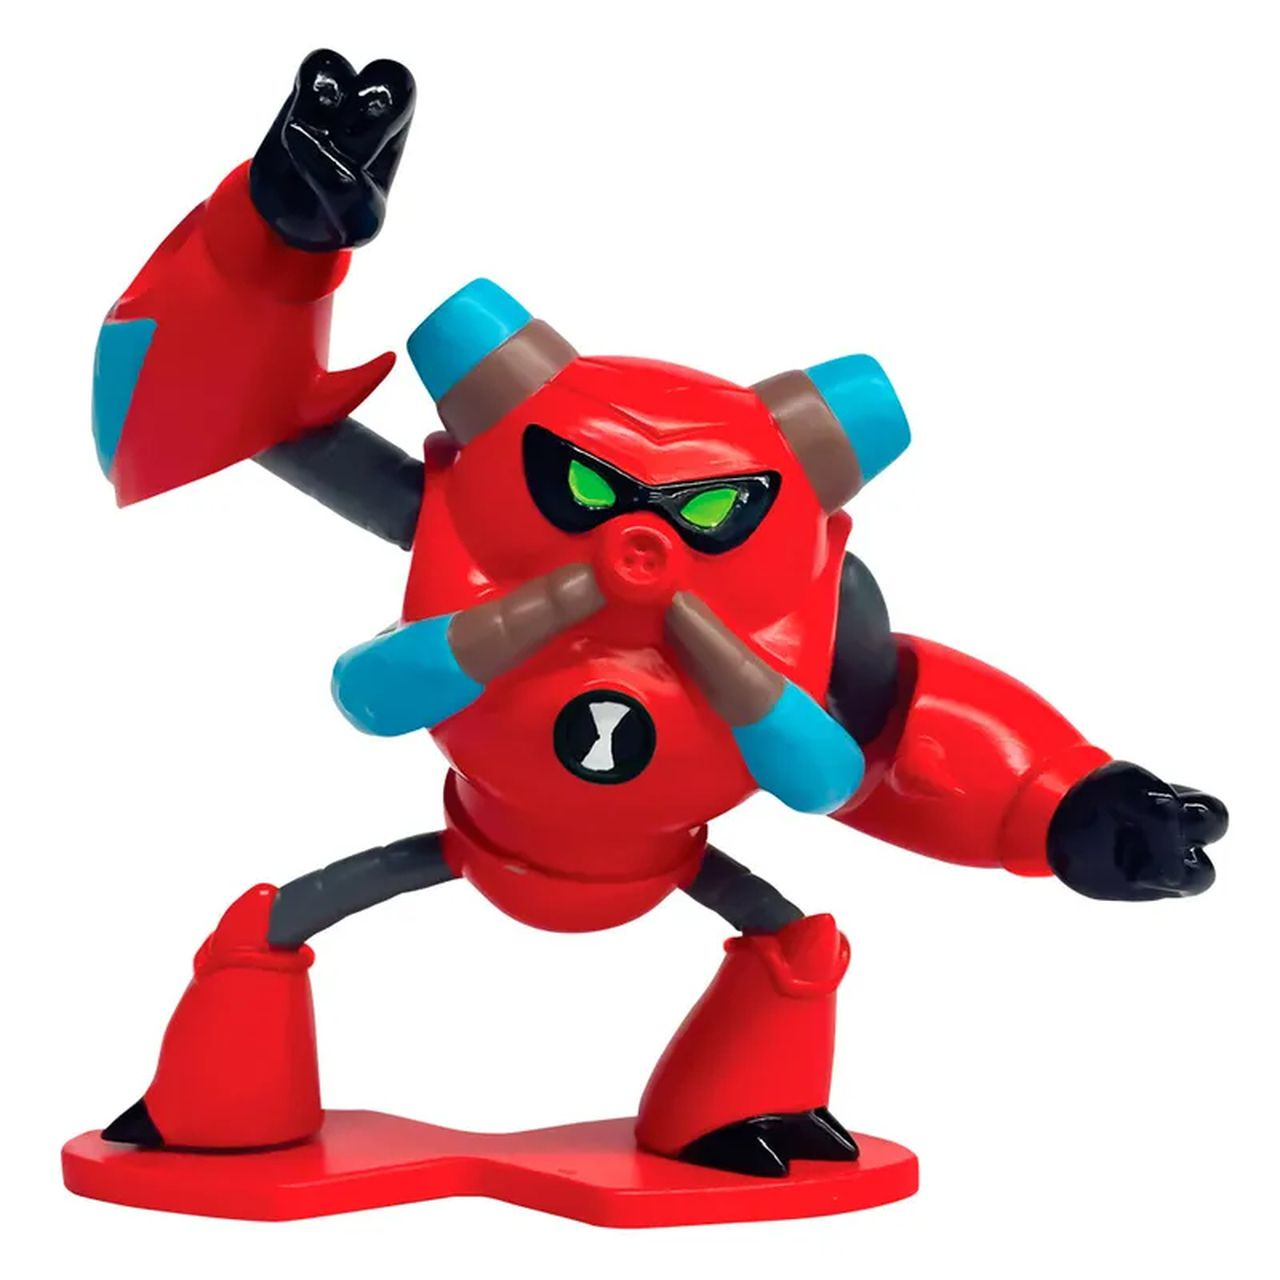 Mini Figuras - Ben 10 - Boneco Enxurrada - Original Sunny